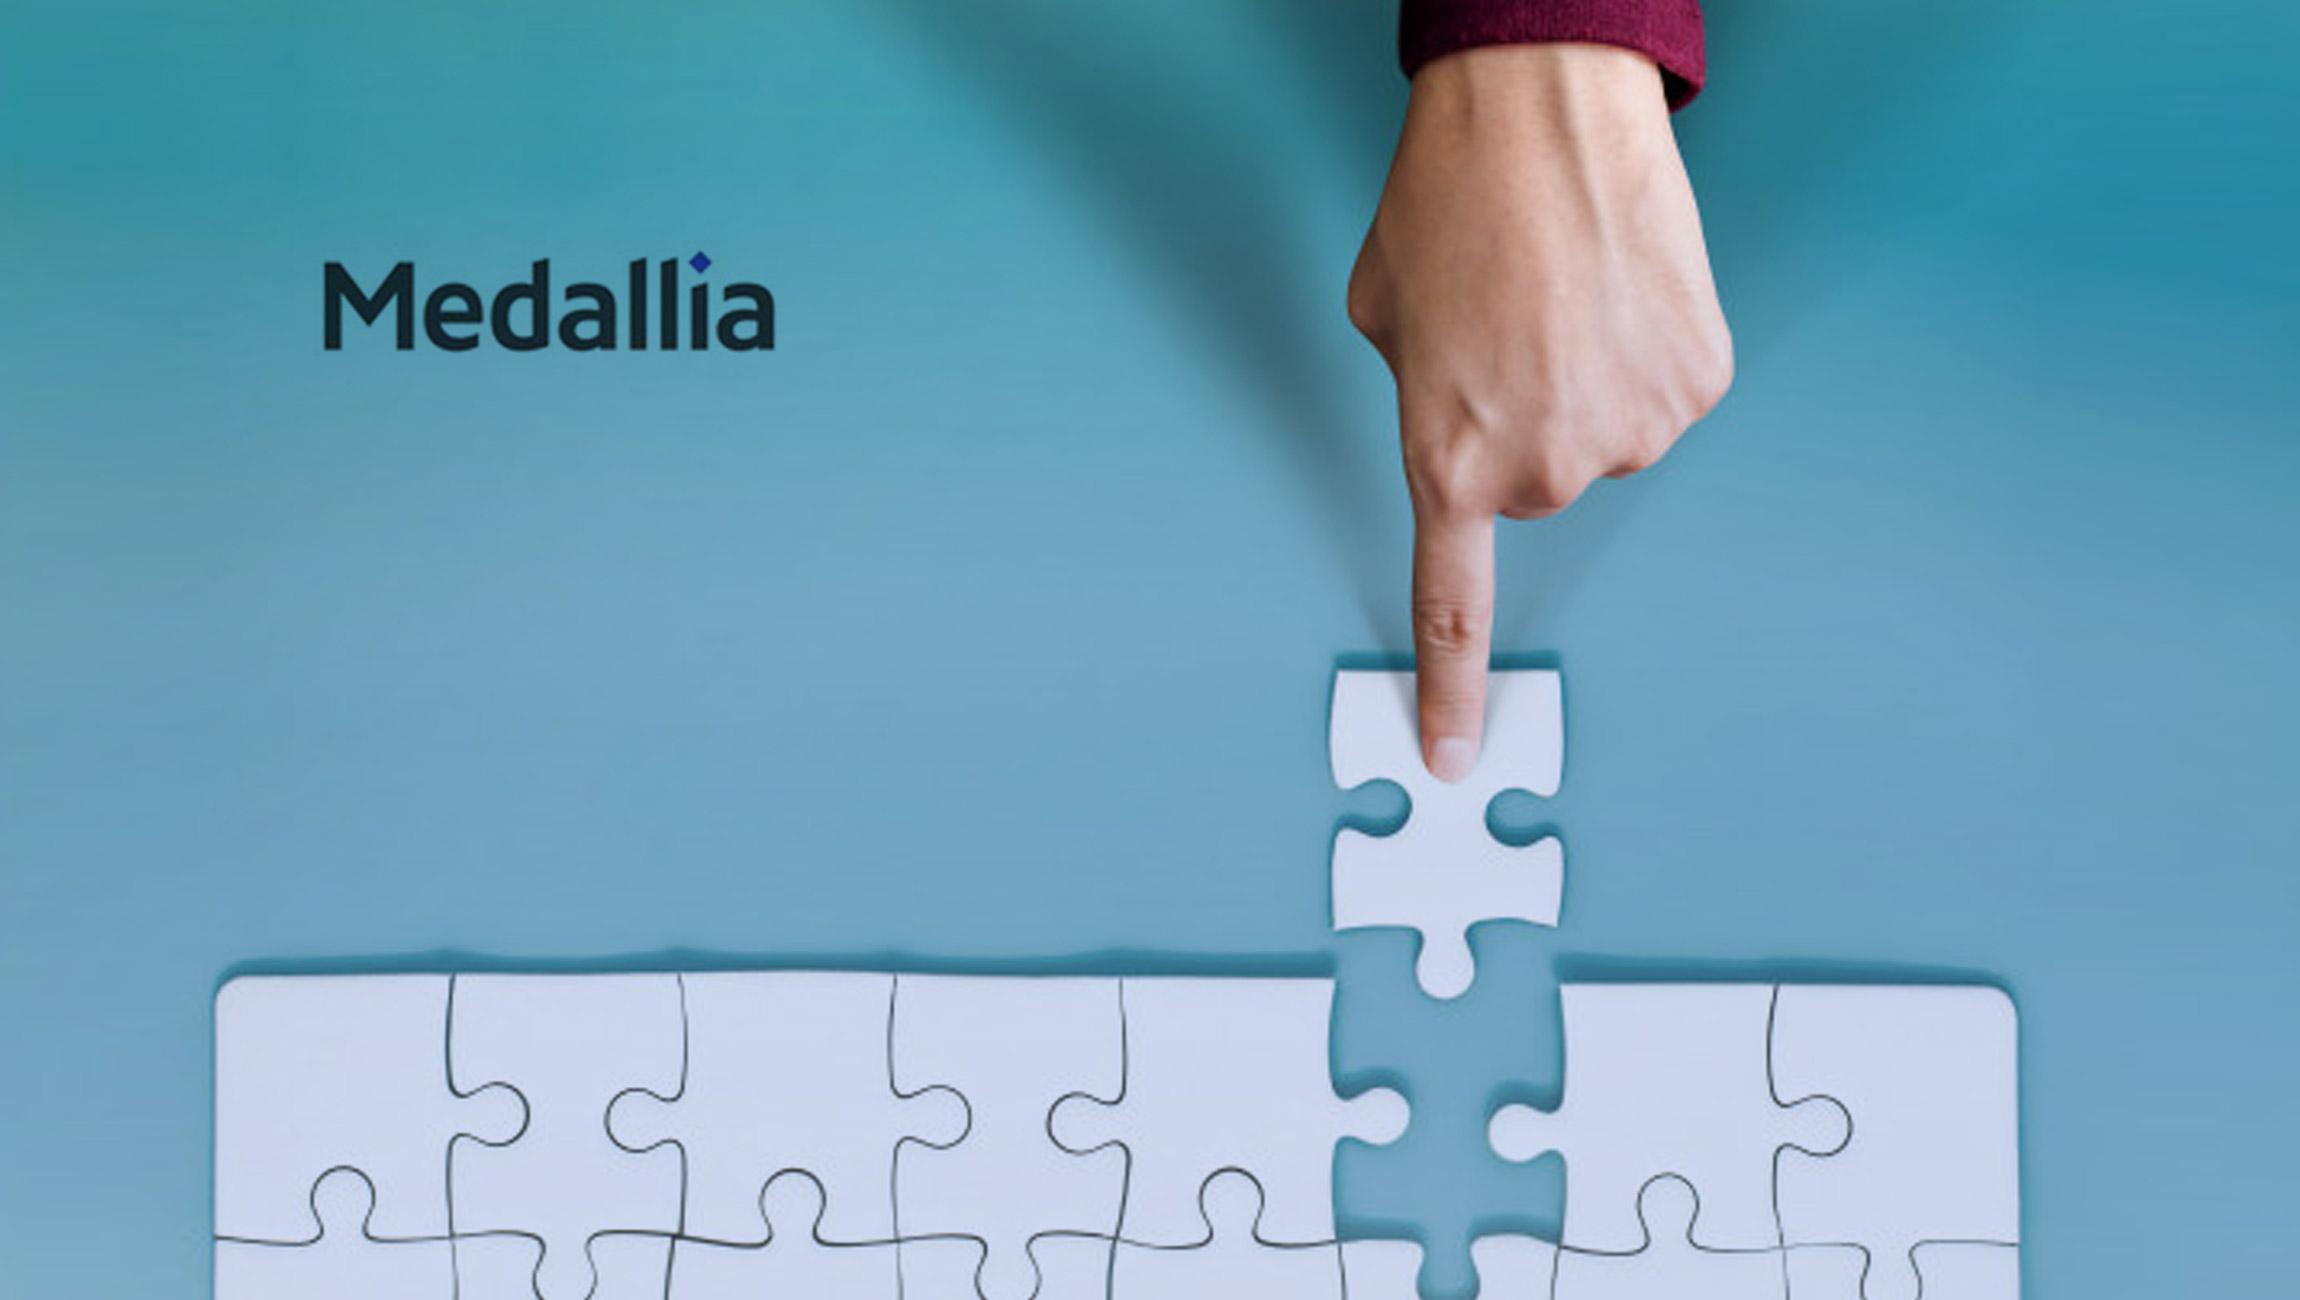 Medallia Becomes Premier-Level Partner in Adobe Exchange Partner Program